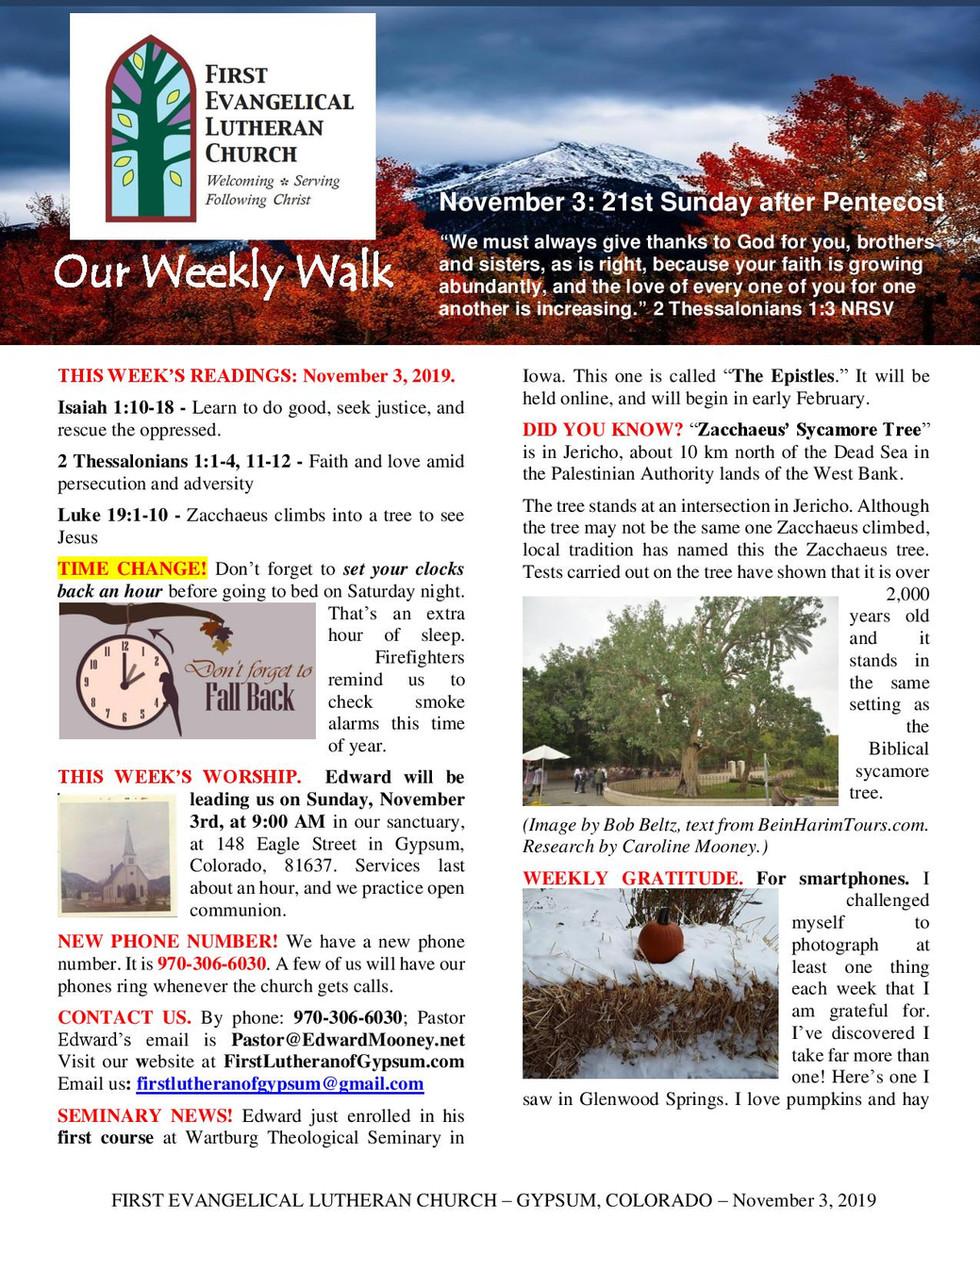 Newsletter - November 3, 2019, Page 1